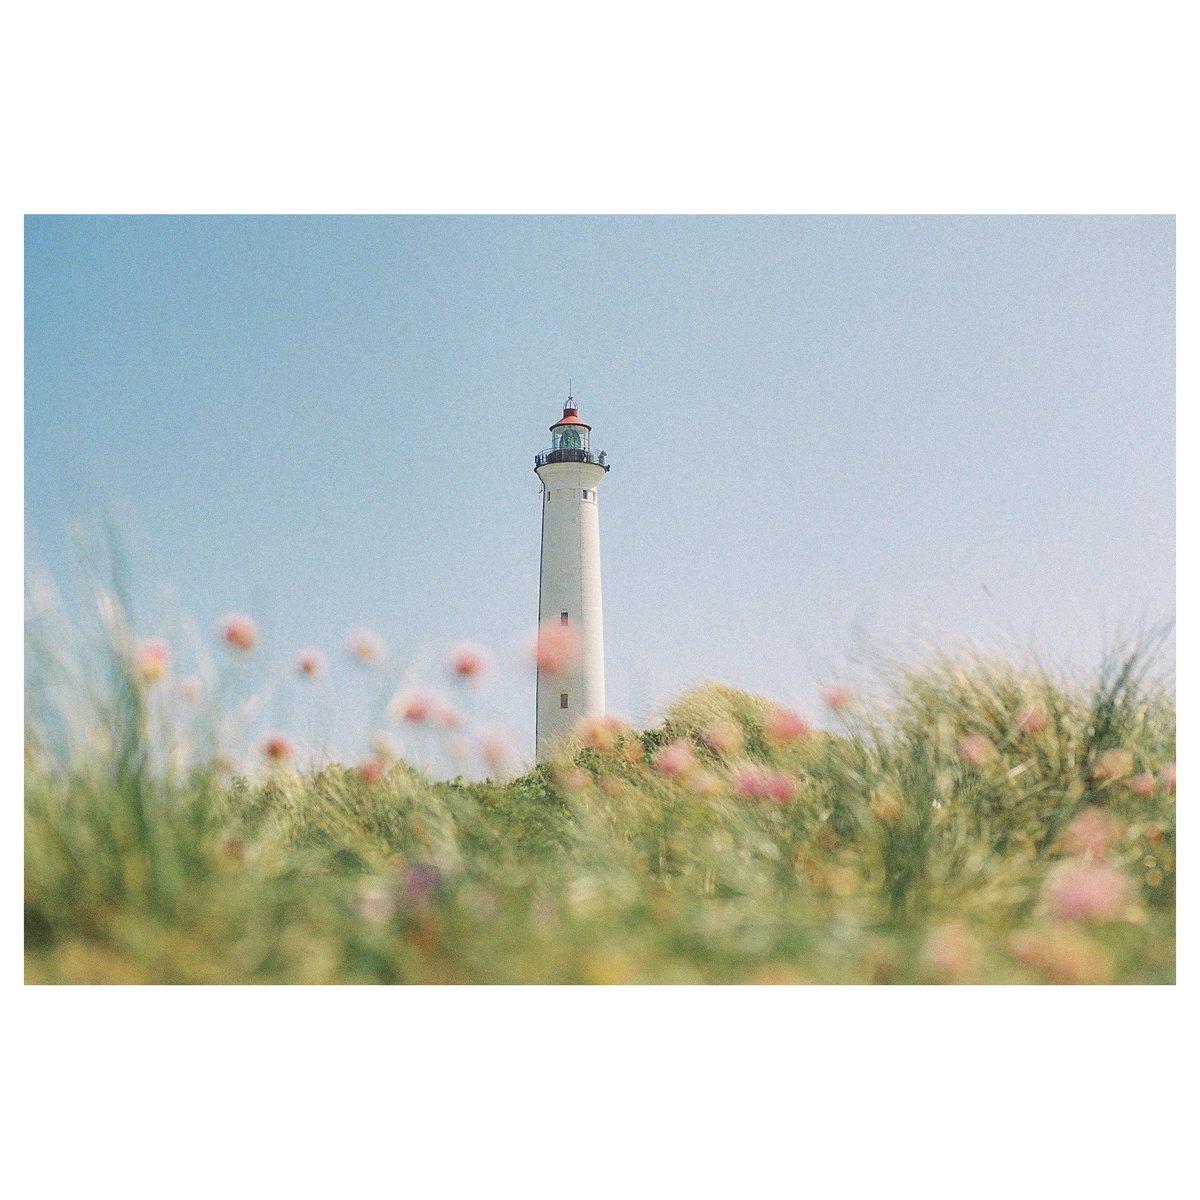 Summer | Leica MP | Portra 160 #analog #analogue #analogfilm #analogphoto #film #filmphoto  Instagram: scottish_swan pic.twitter.com/eiQe6SivQC  by Analog Process